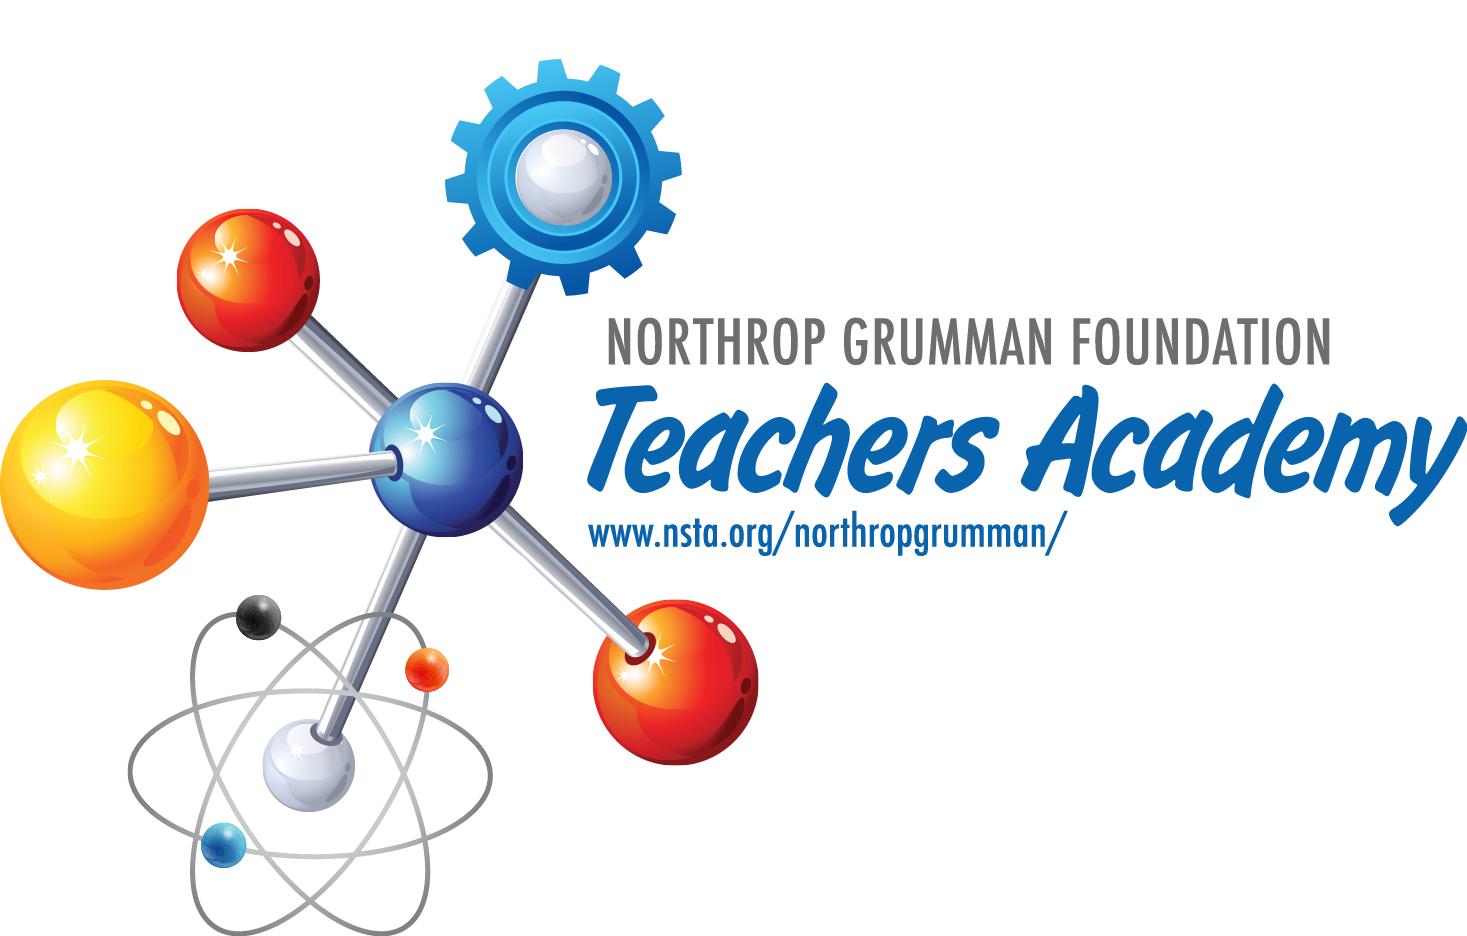 Northrop Grumman Foundation Teachers Academy- Logo